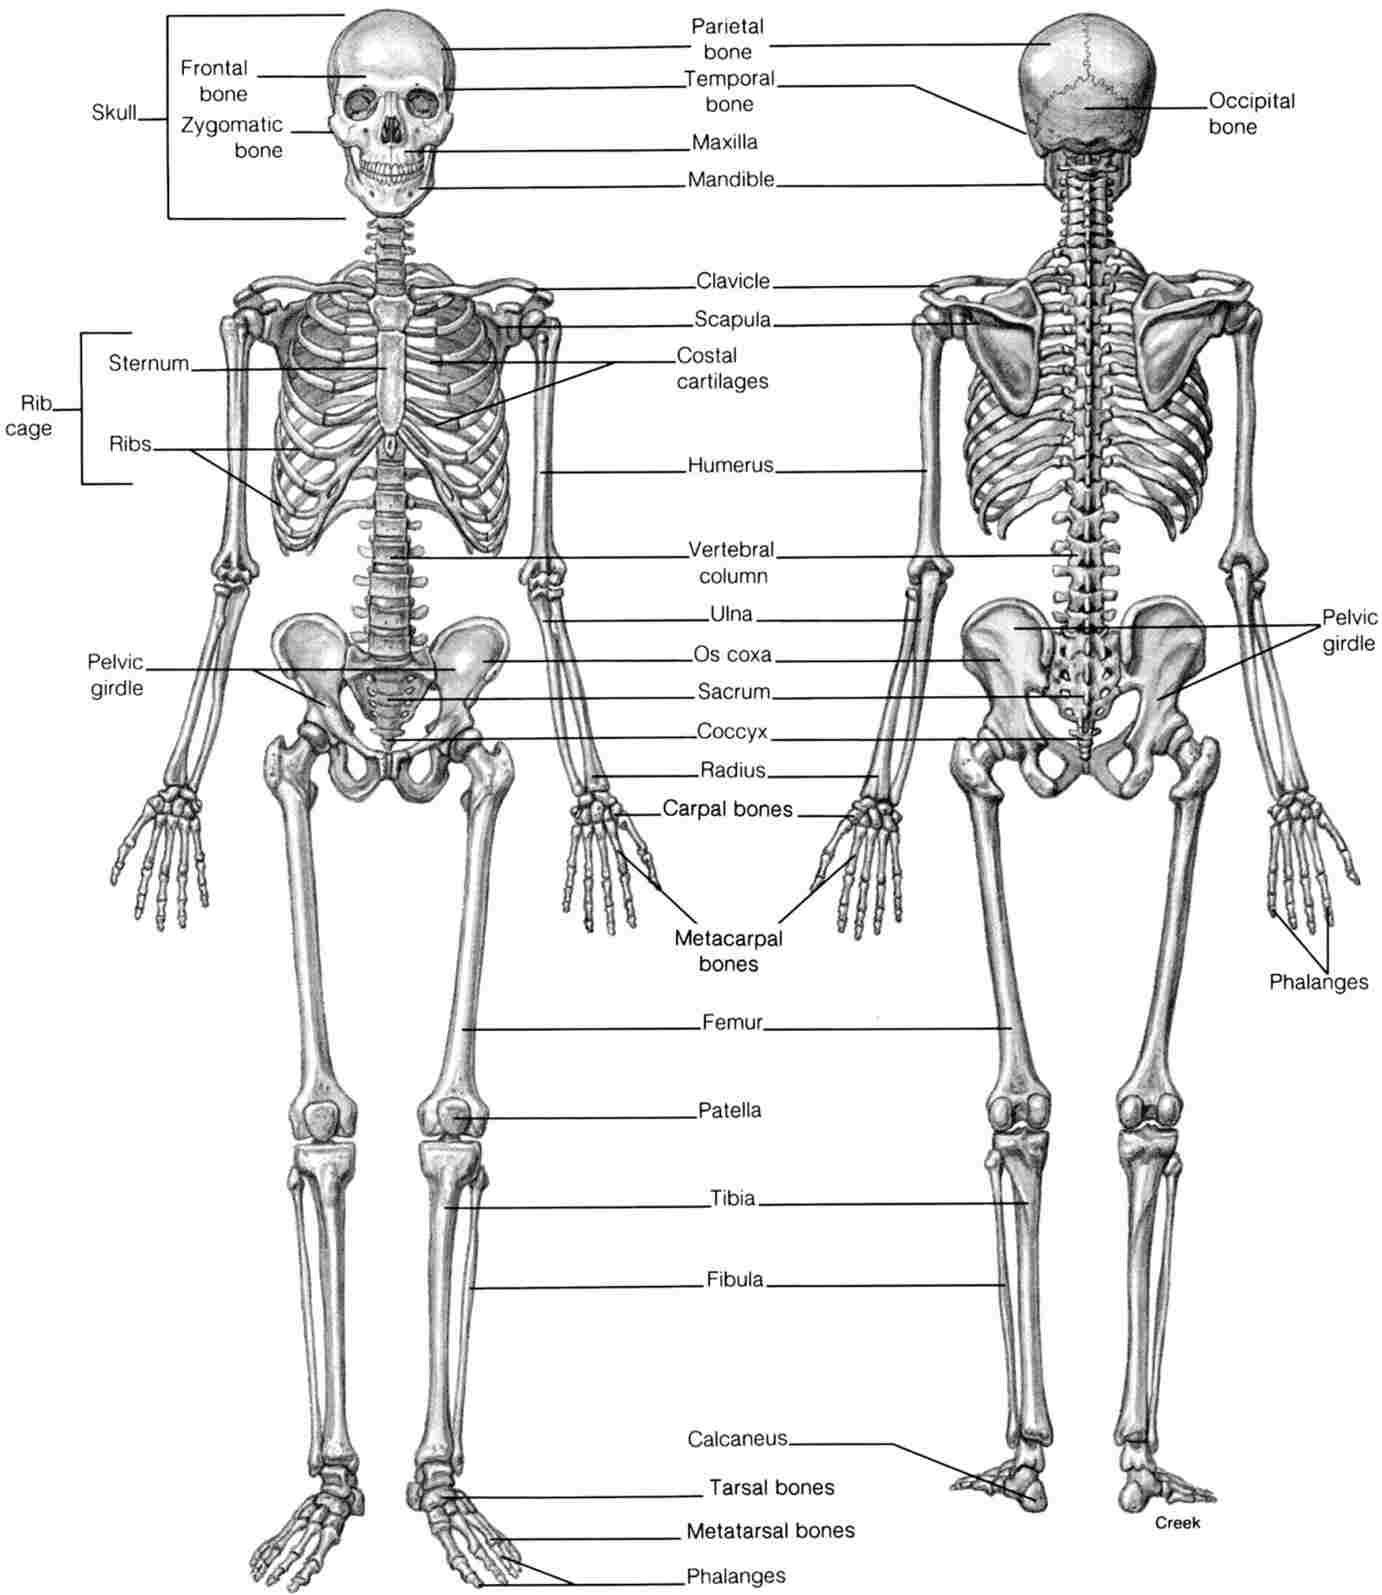 Human Skeletal System Drawing At Paintingvalley